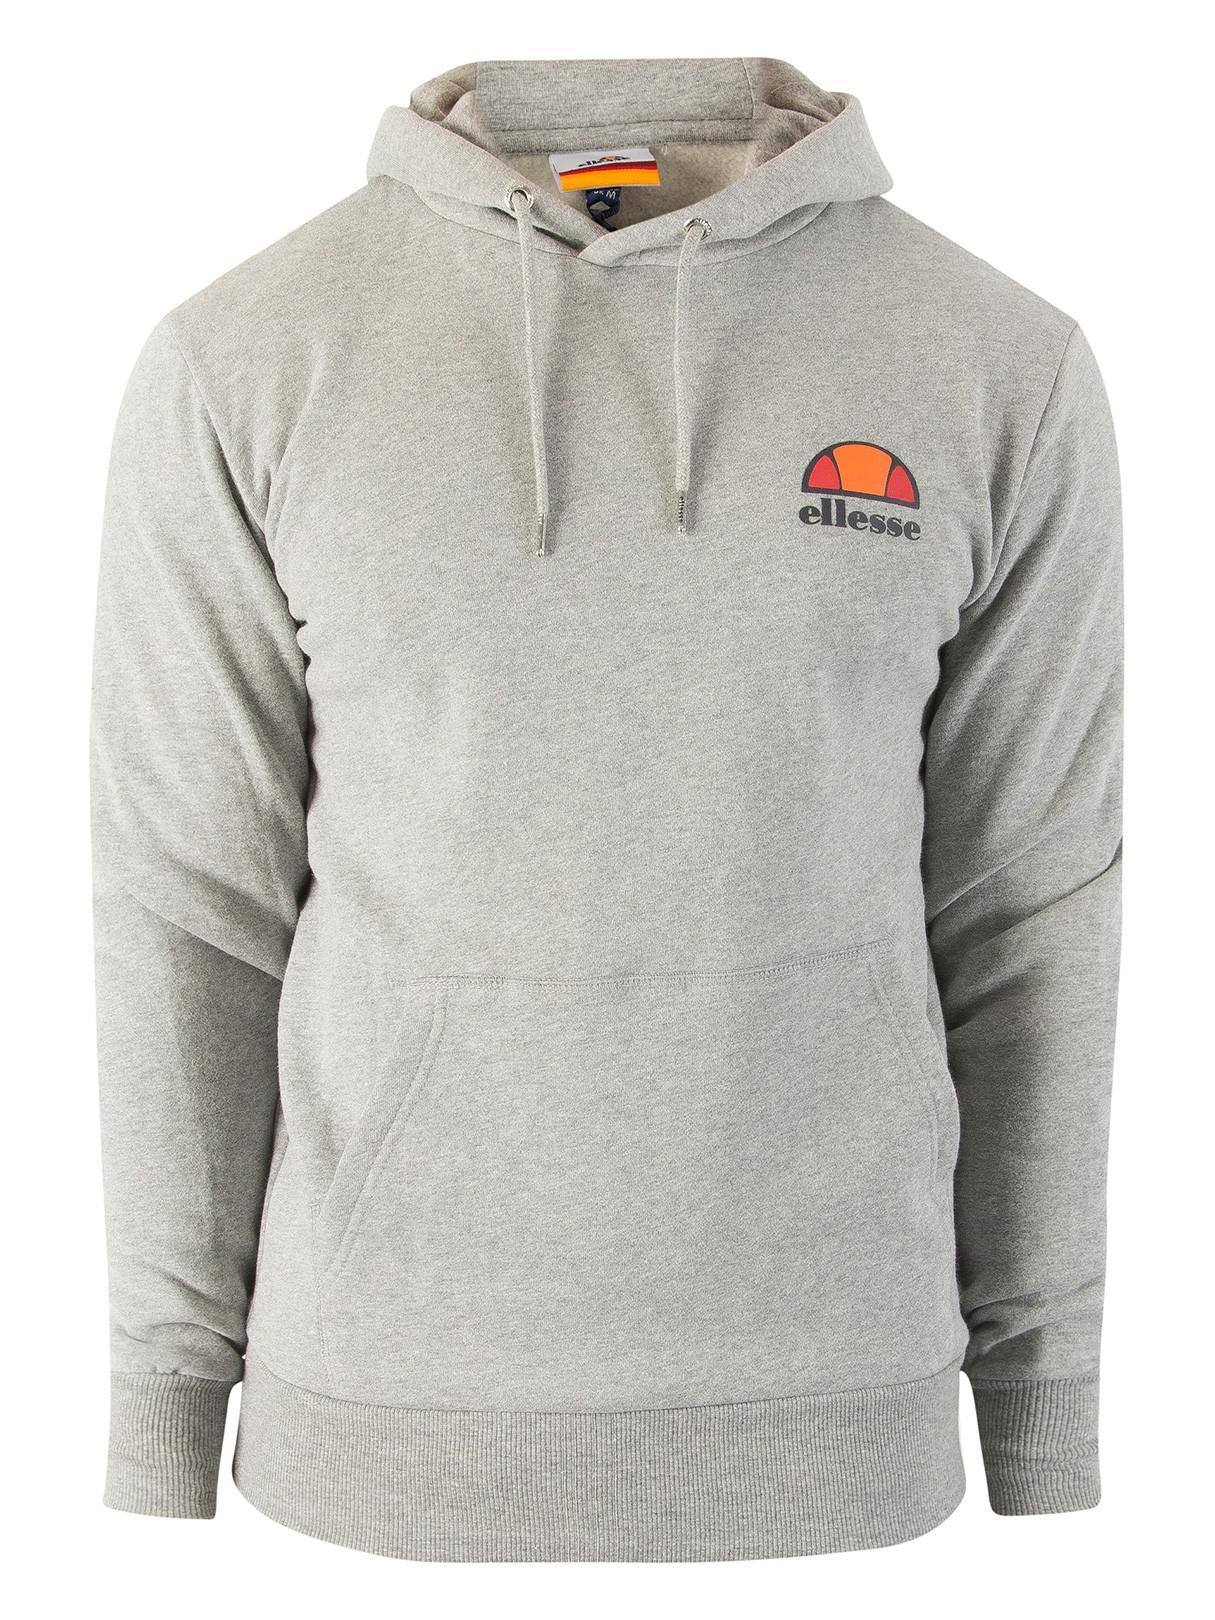 Ellesse Men/'s Toce Left Logo Hoodie Grey